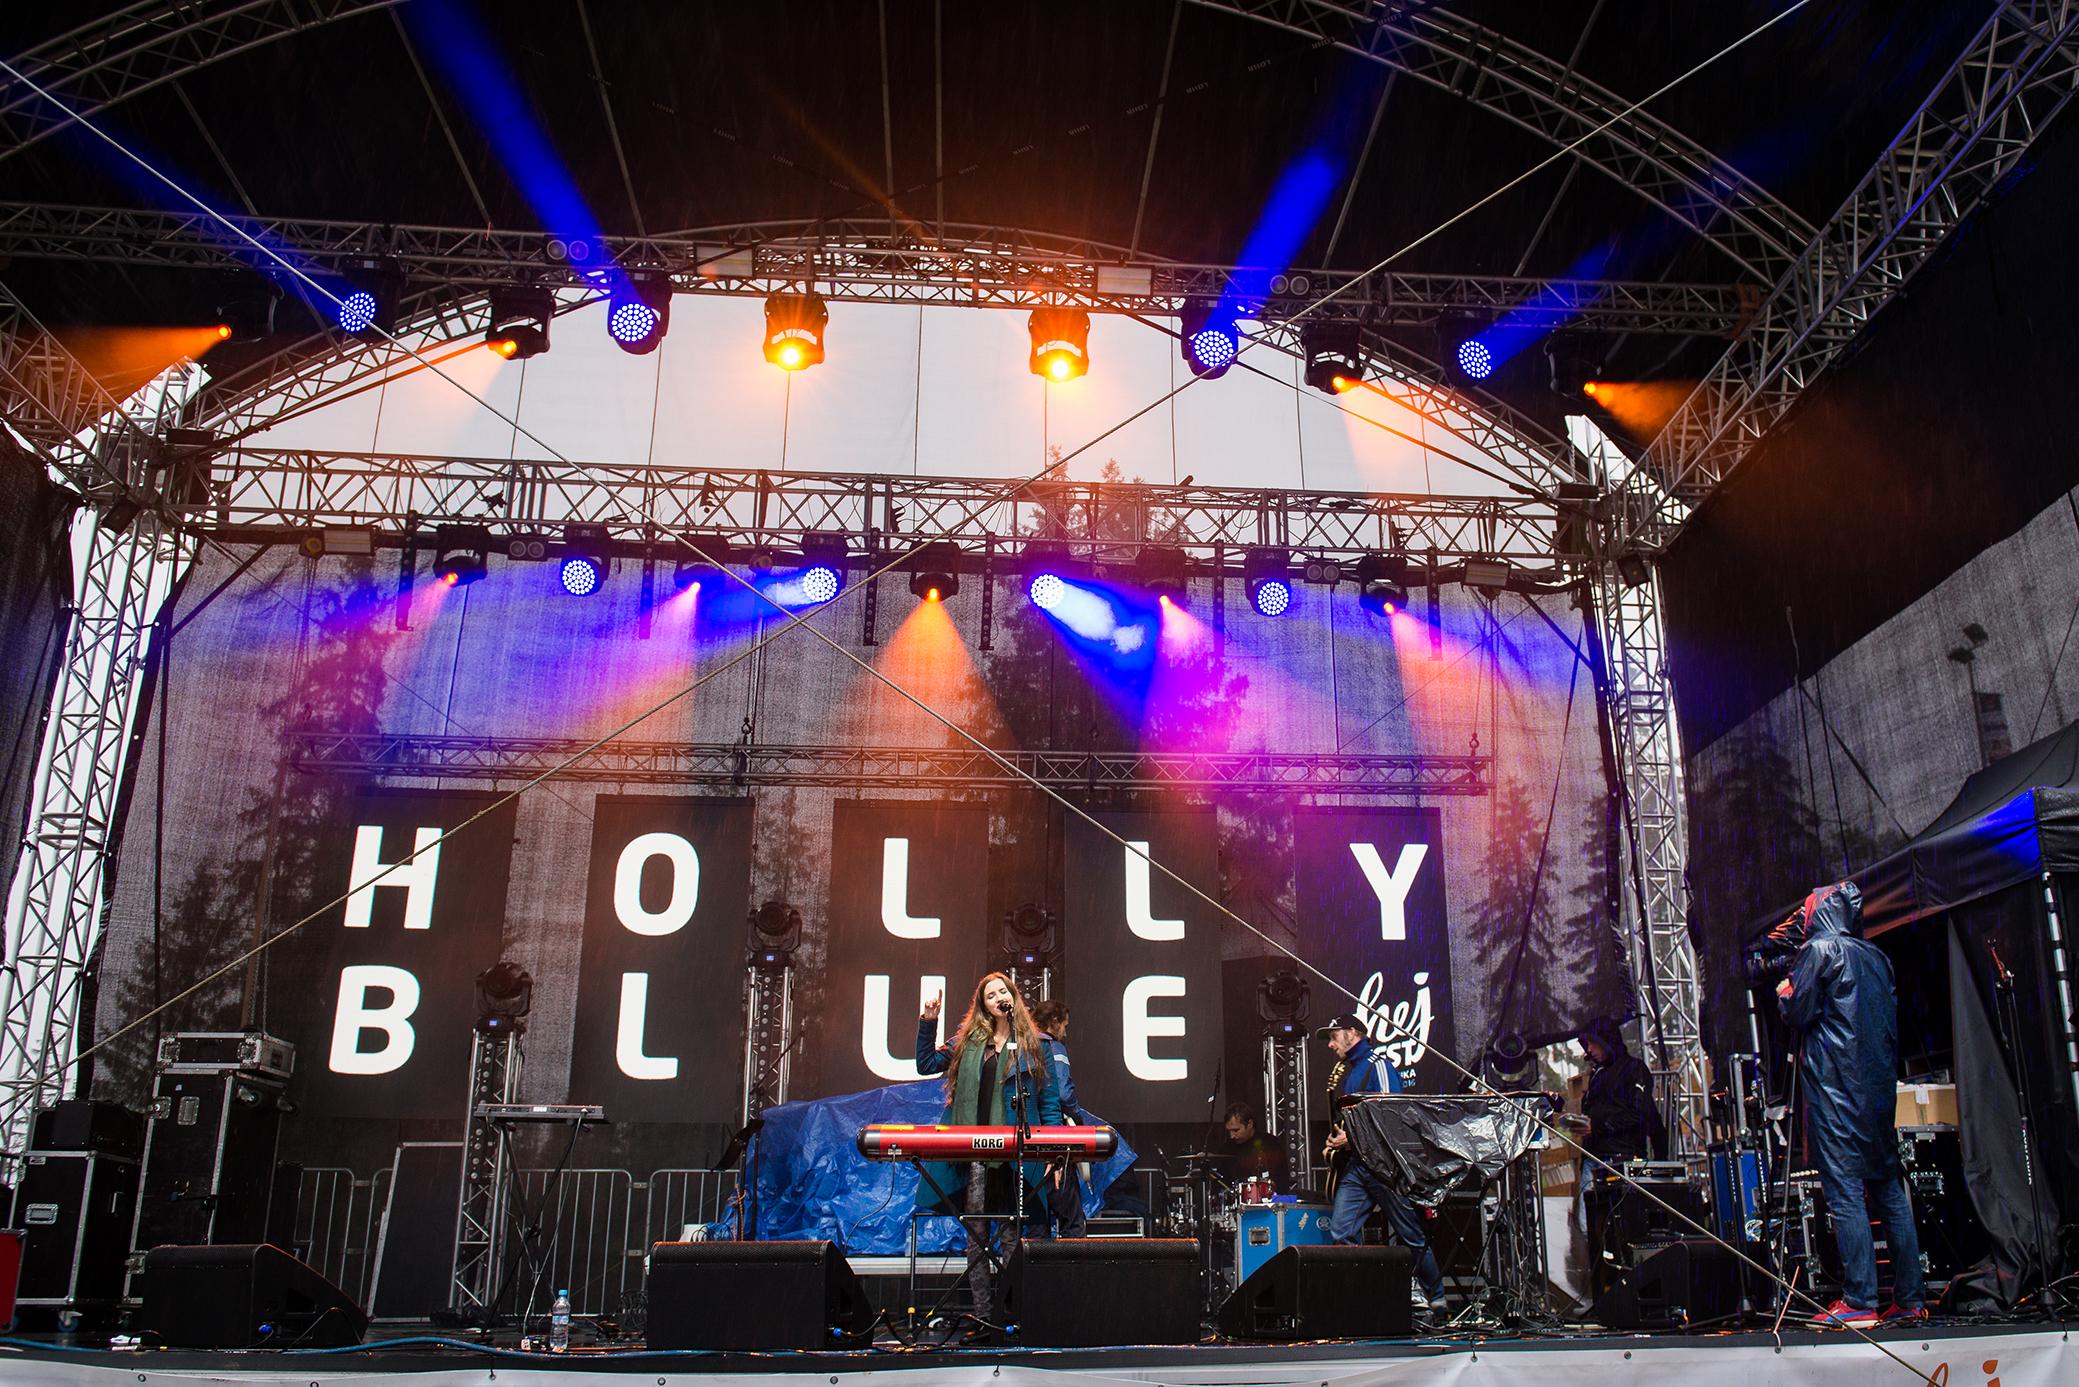 Holly_Blue.jpg